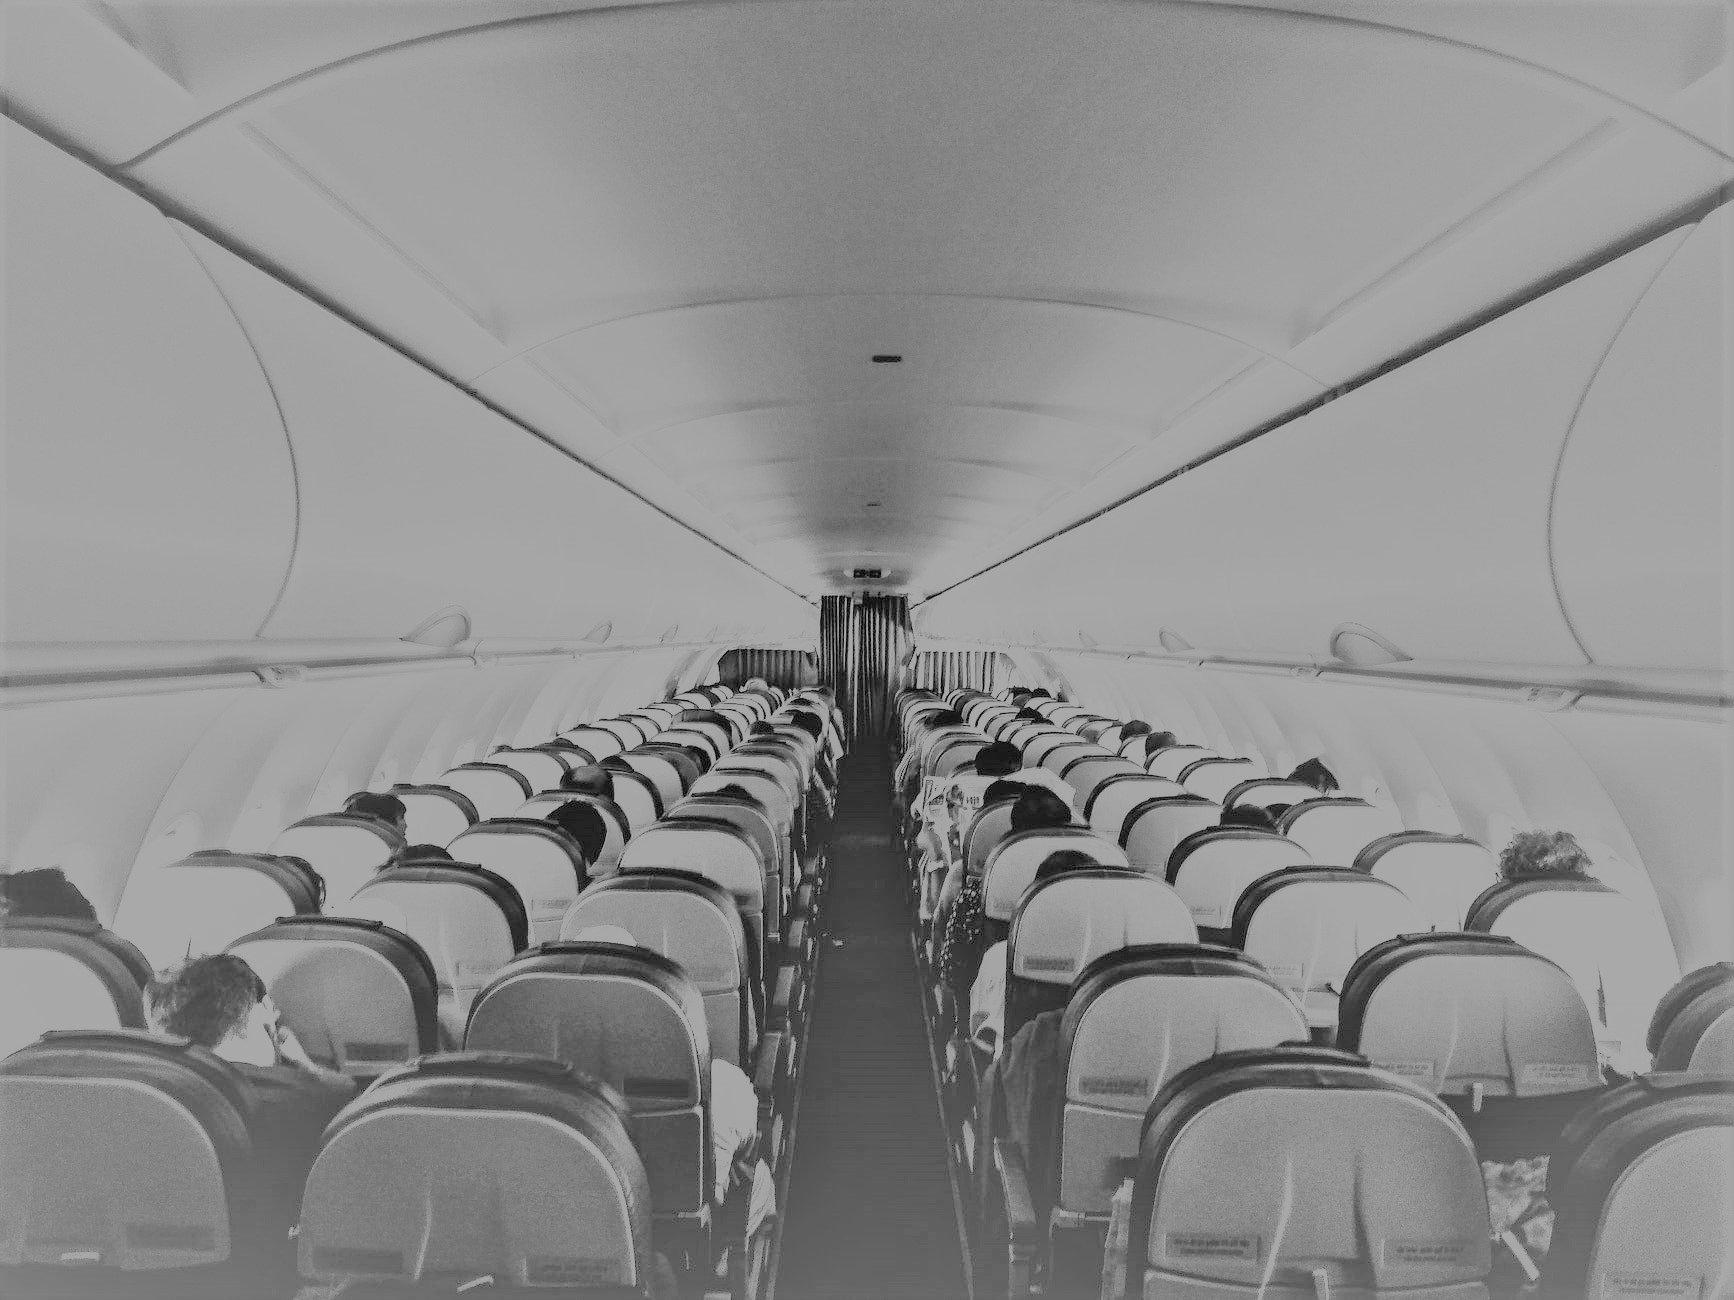 free flights